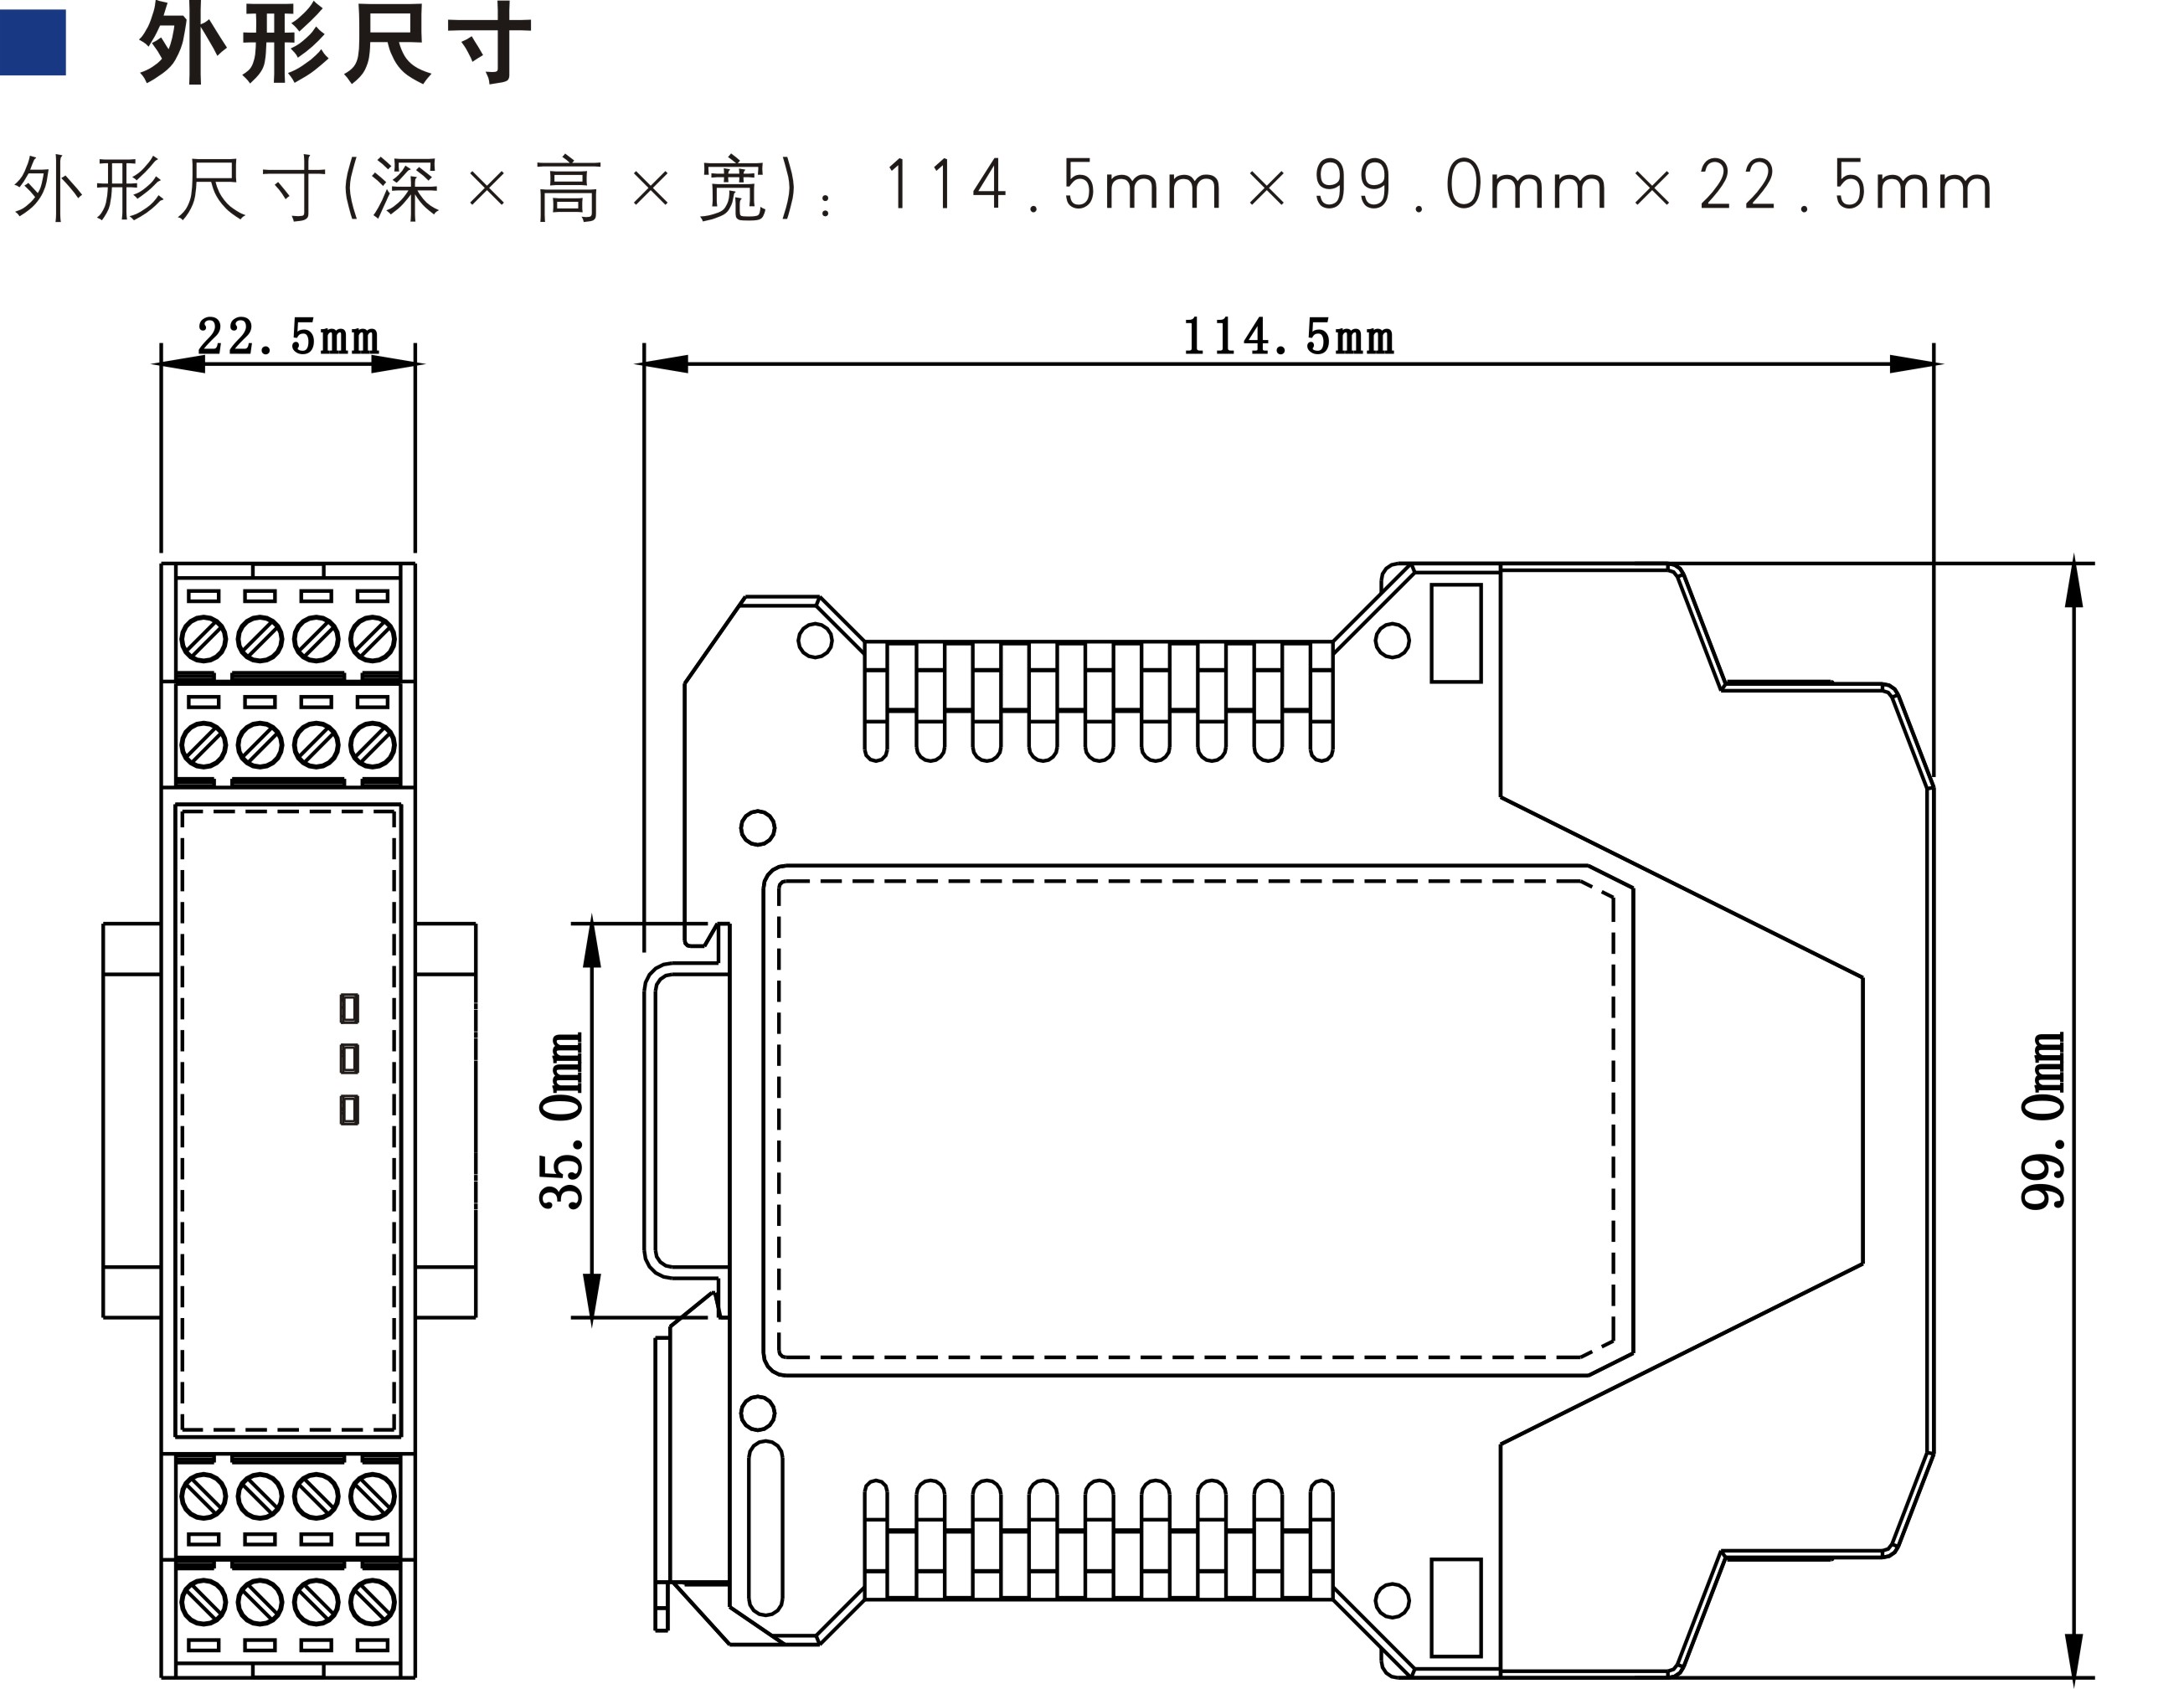 DO信号(SIS系统)输入 (DO信号(SIS系统) 24V DC 3NO+1NC 5A)